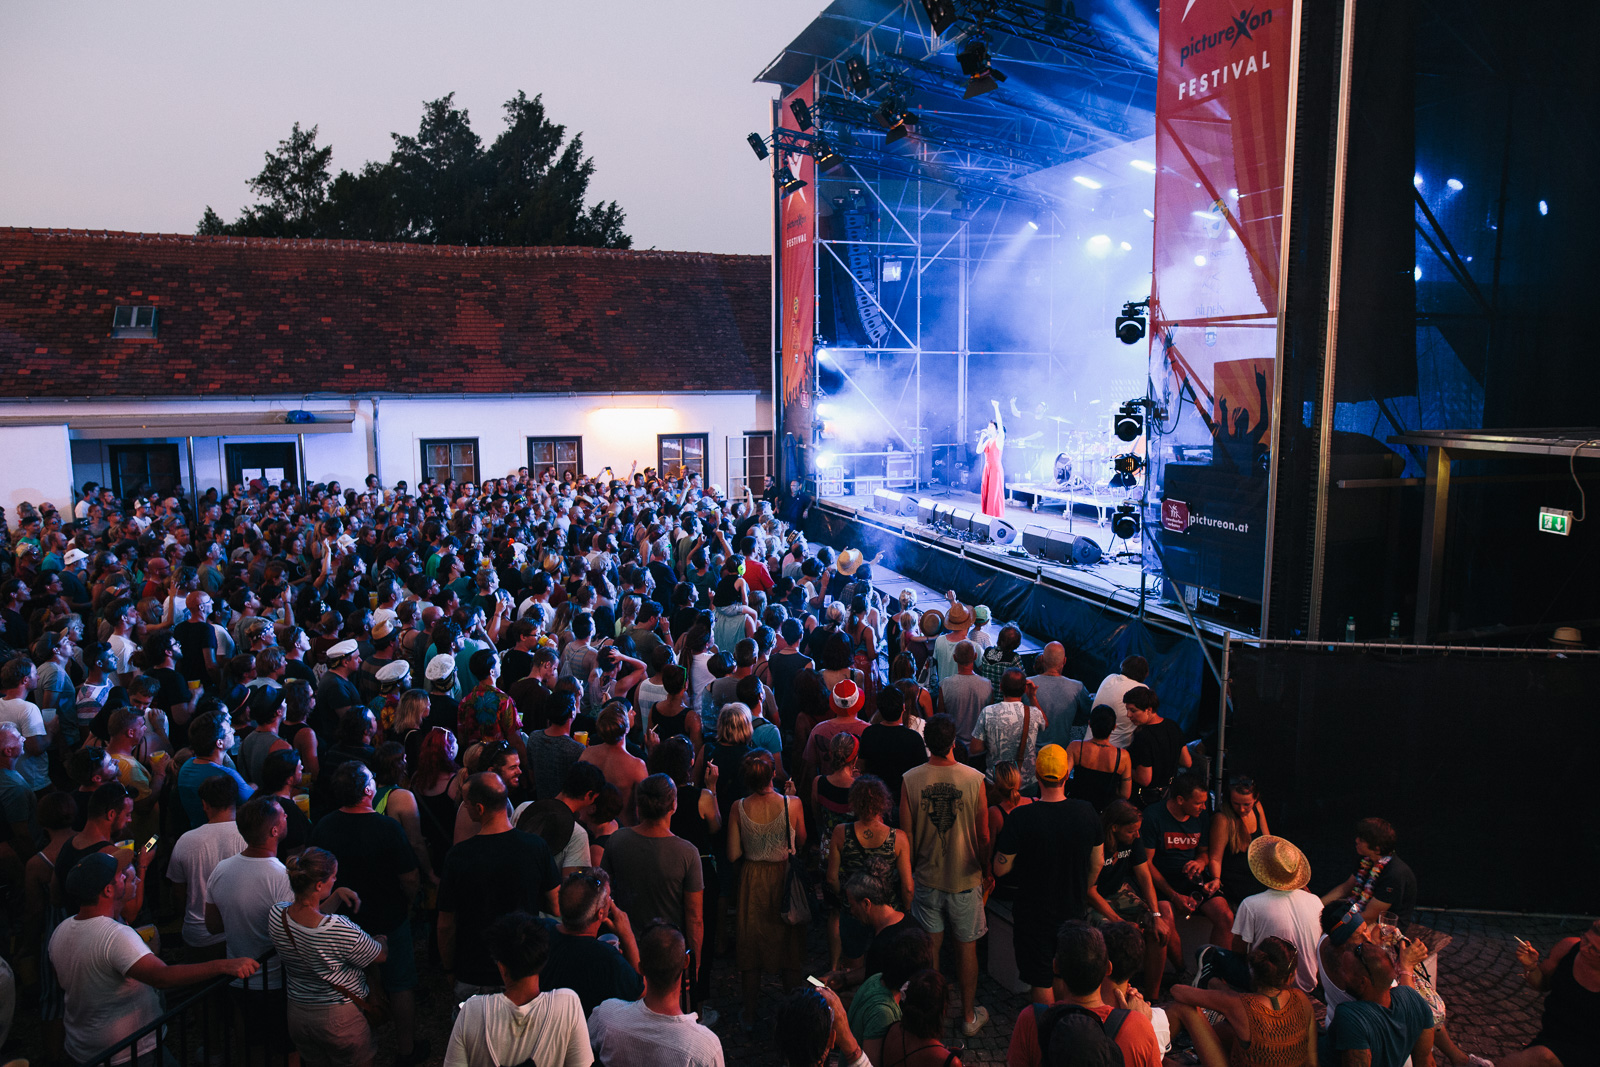 Fiva; Festival; Concert; Konzert; FivaMC; PictureOn;